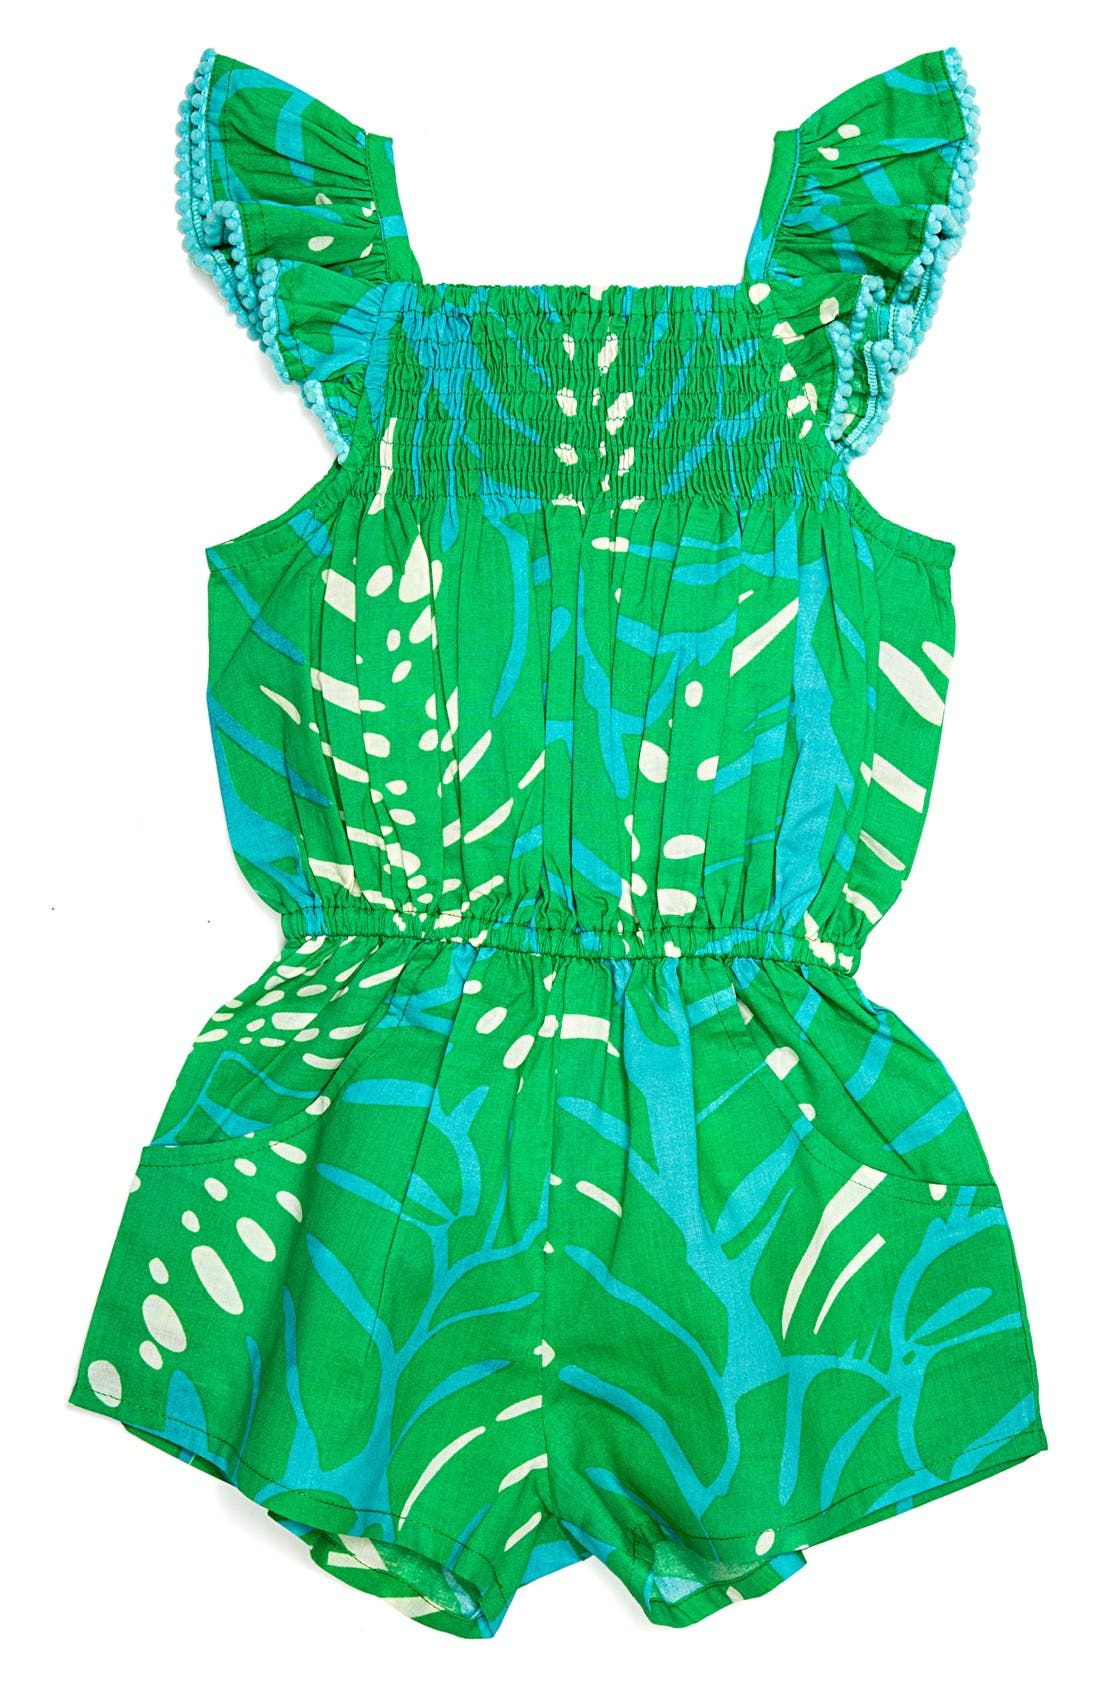 Alternate Image 1 Selected - Masalababy 'Zuri - Island Palm' Flutter Sleeve Romper (Toddler Girls, Little Girls & Big Girls)